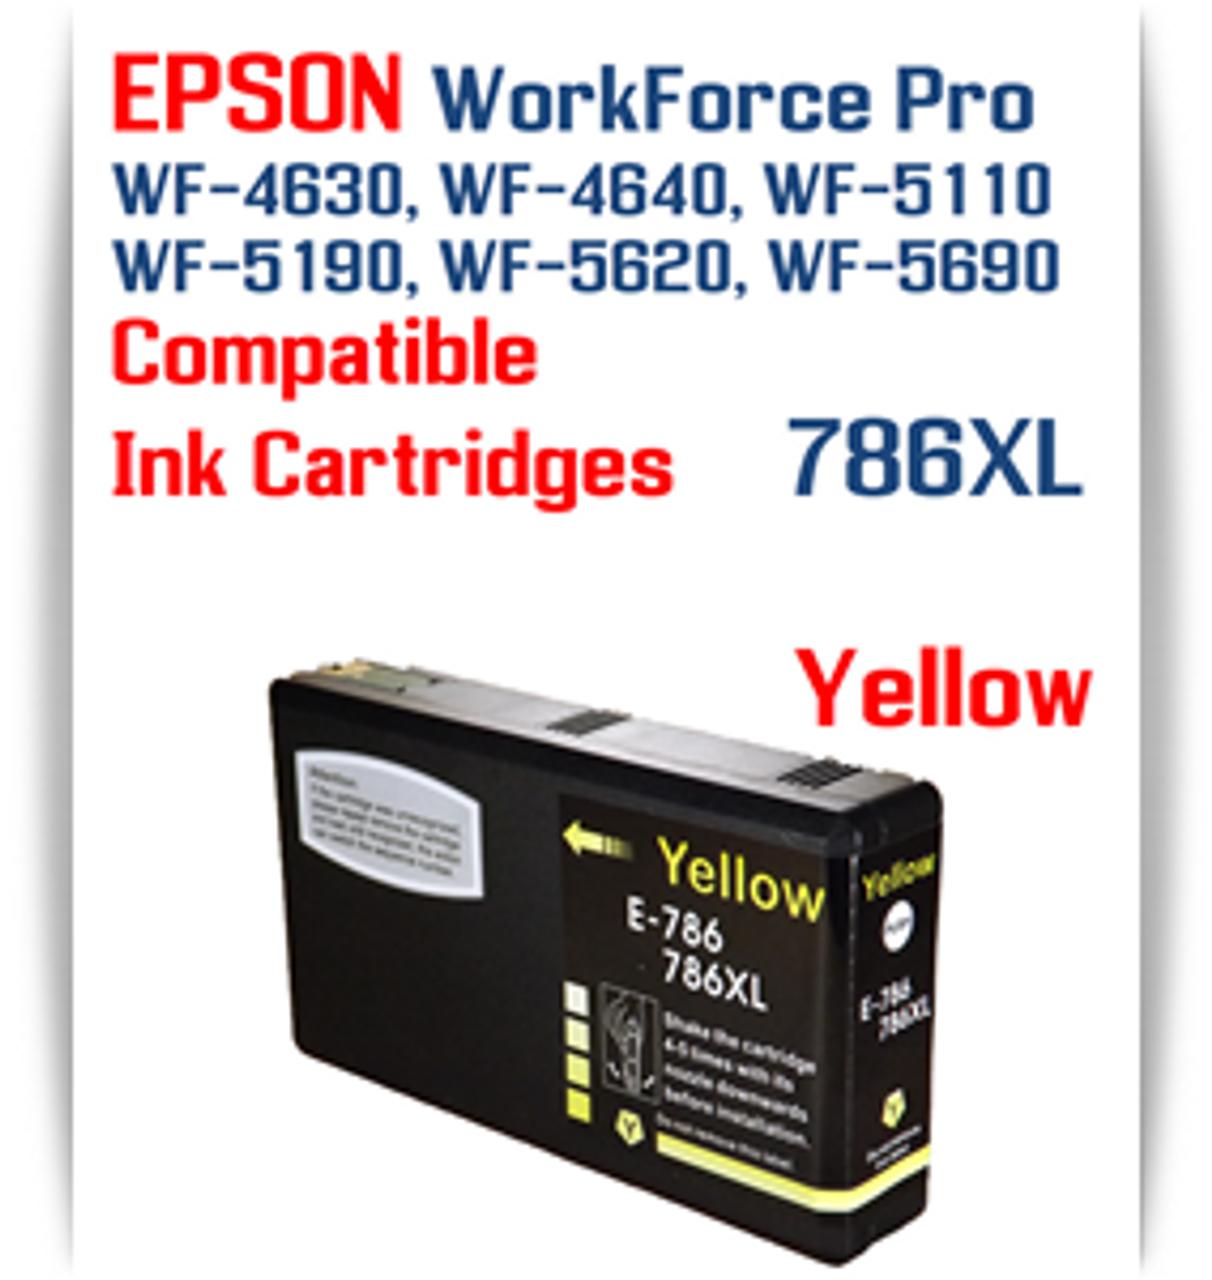 Yellow 786XL Epson WorkForce Pro Printer Compatible Ink Cartridge